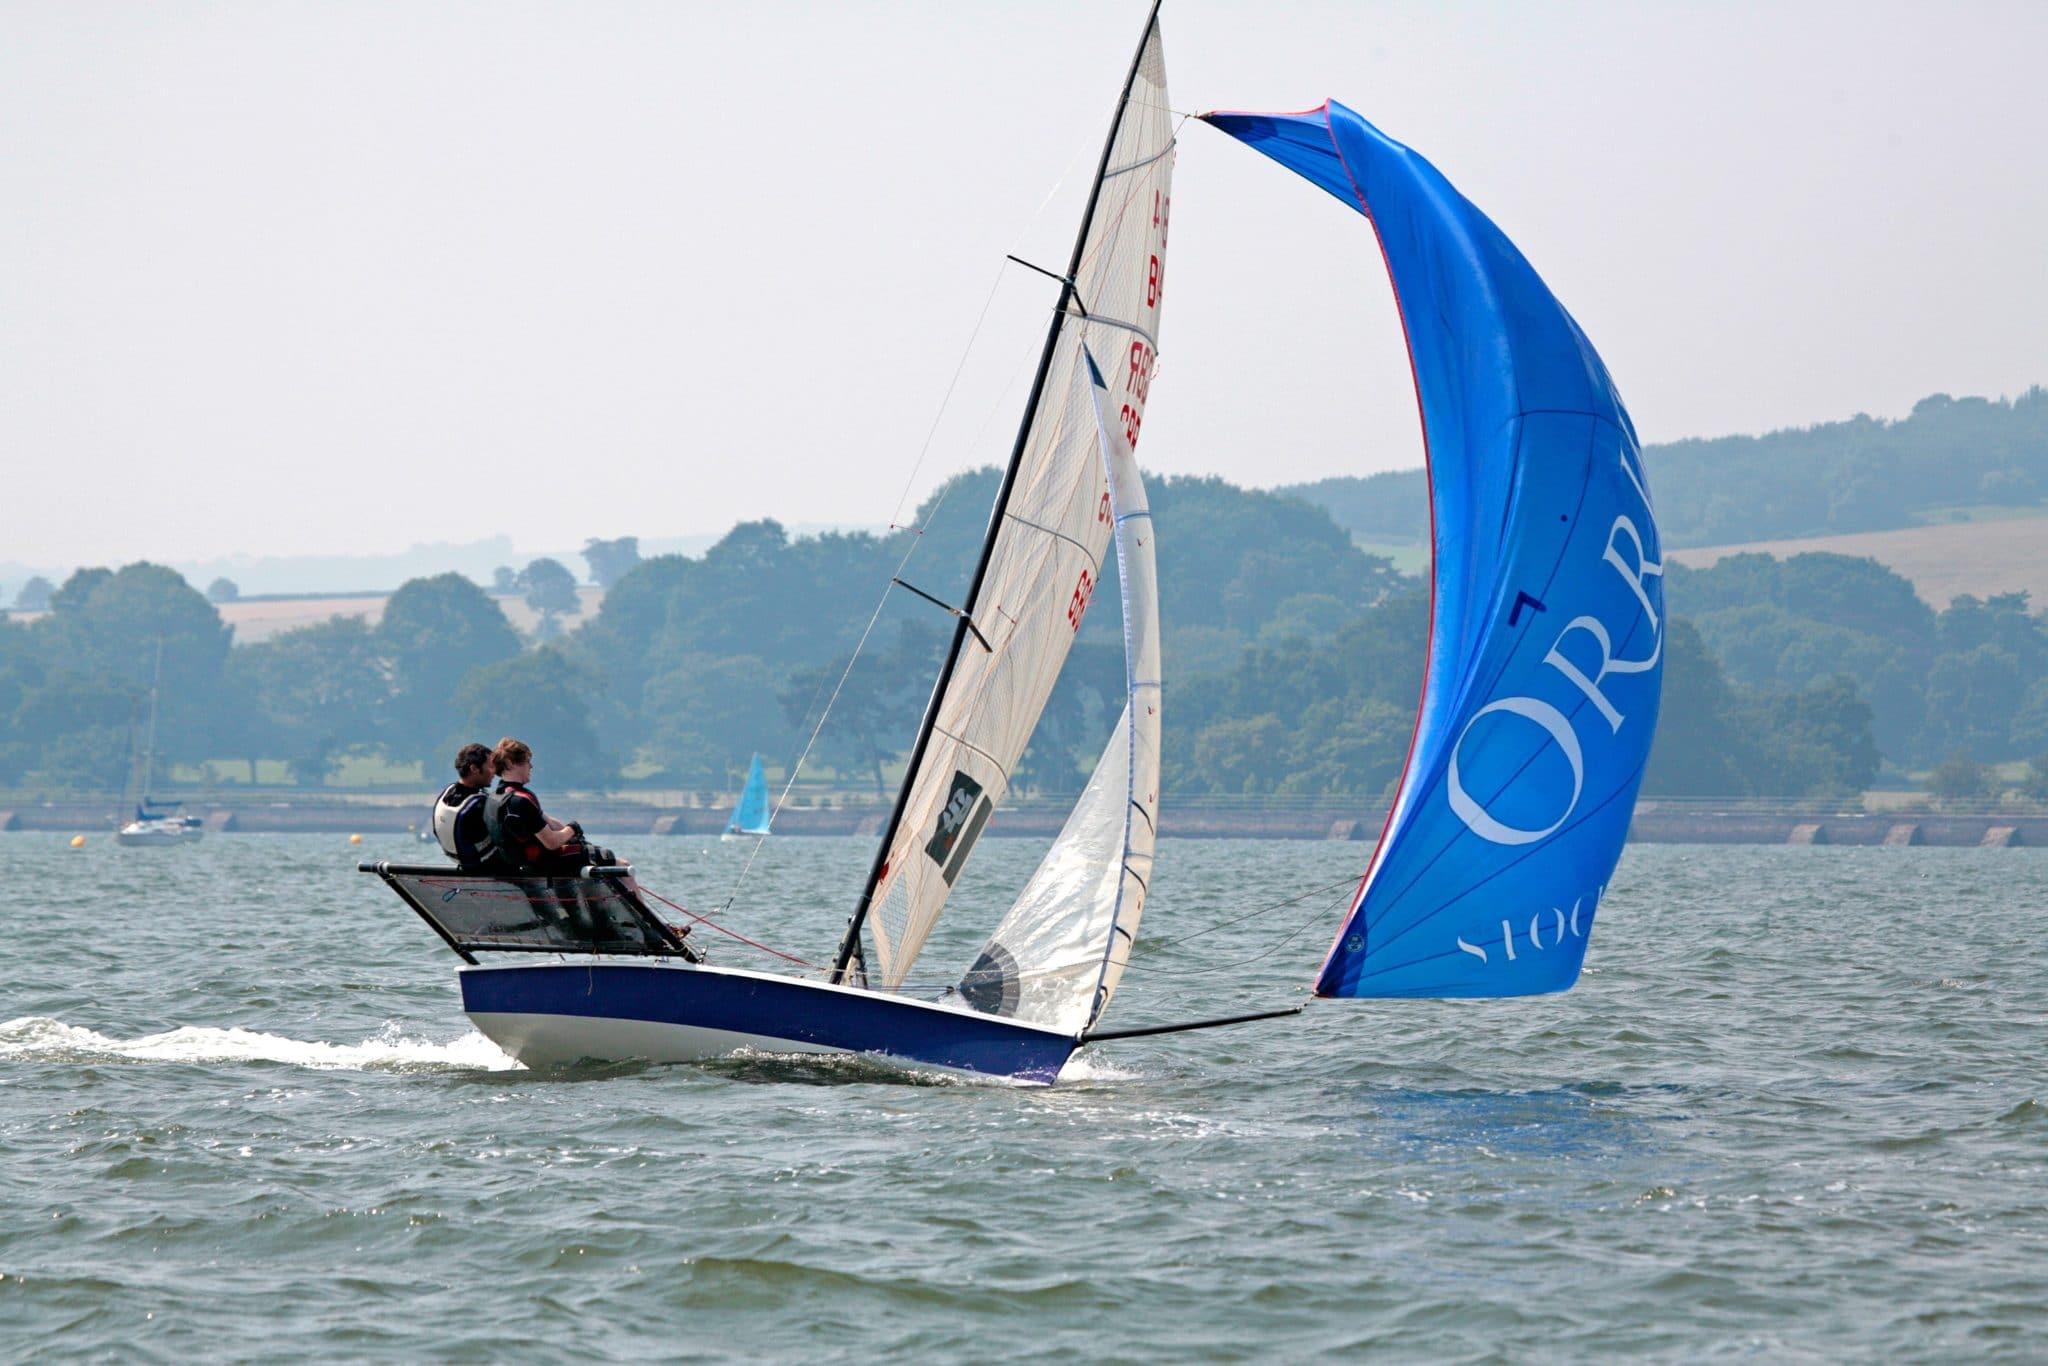 Sailing boat on the Exe Estuary